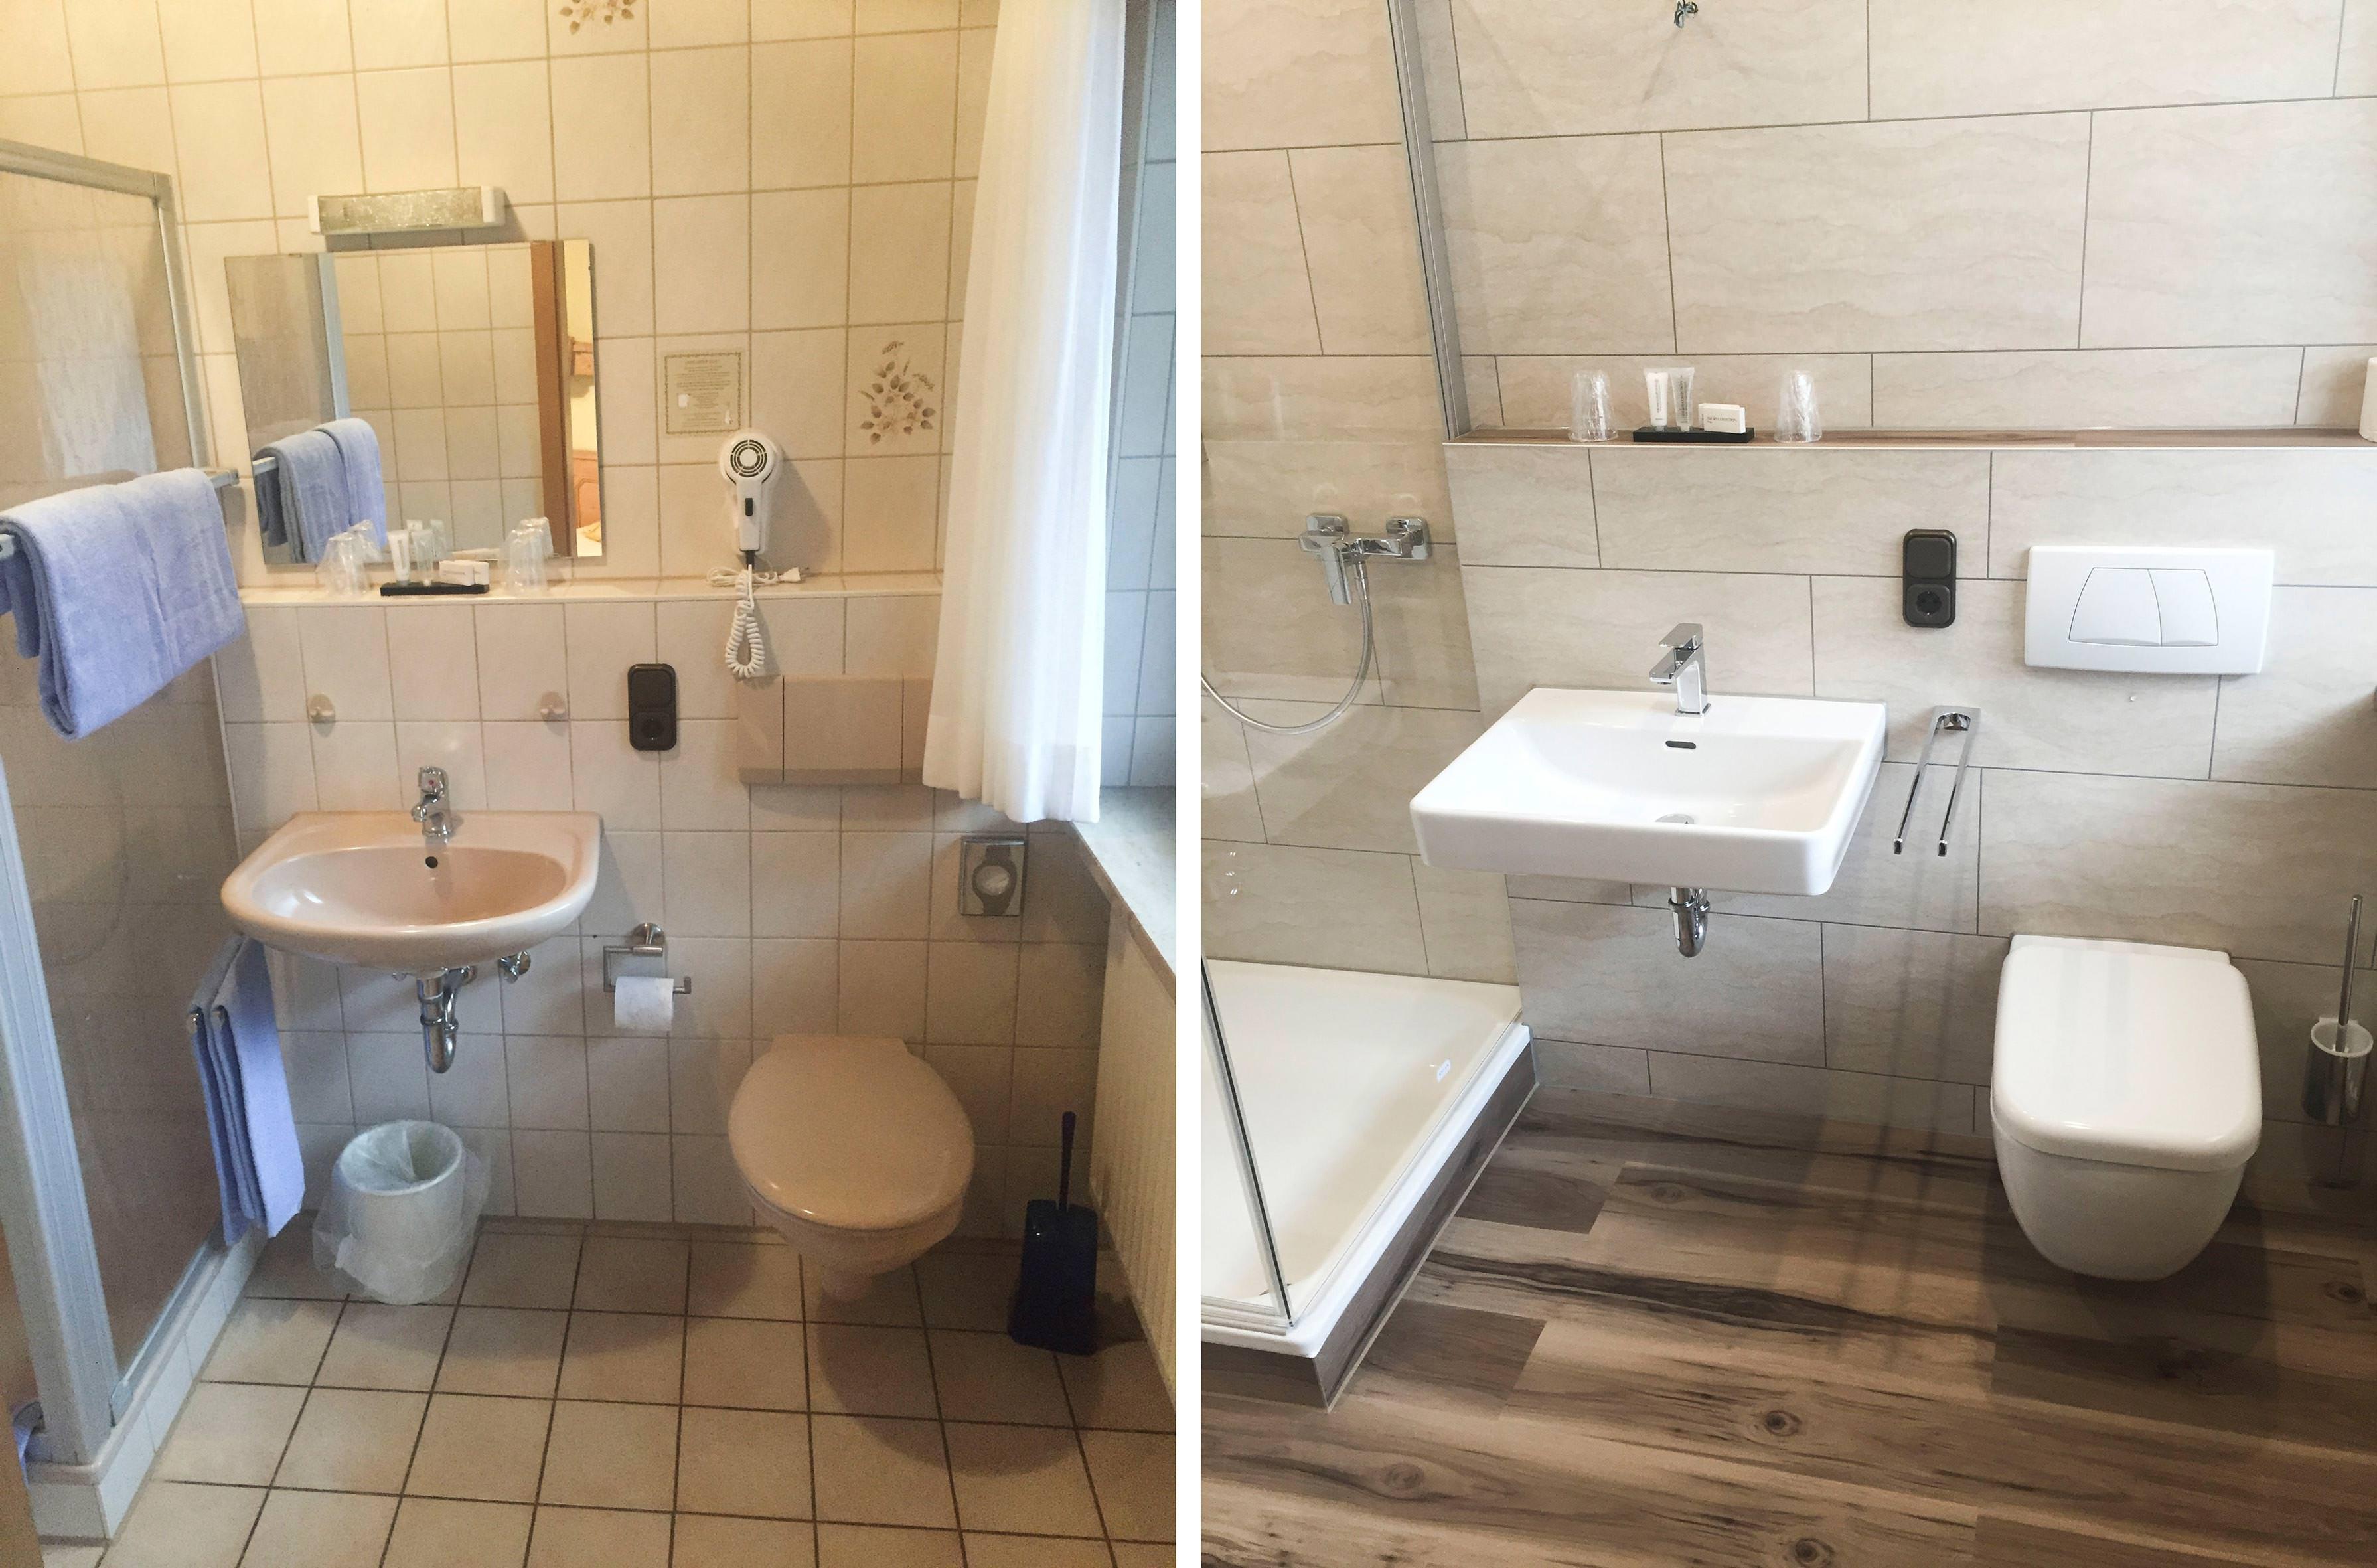 luxury vinyl tile lvt an der wand und im bad. Black Bedroom Furniture Sets. Home Design Ideas